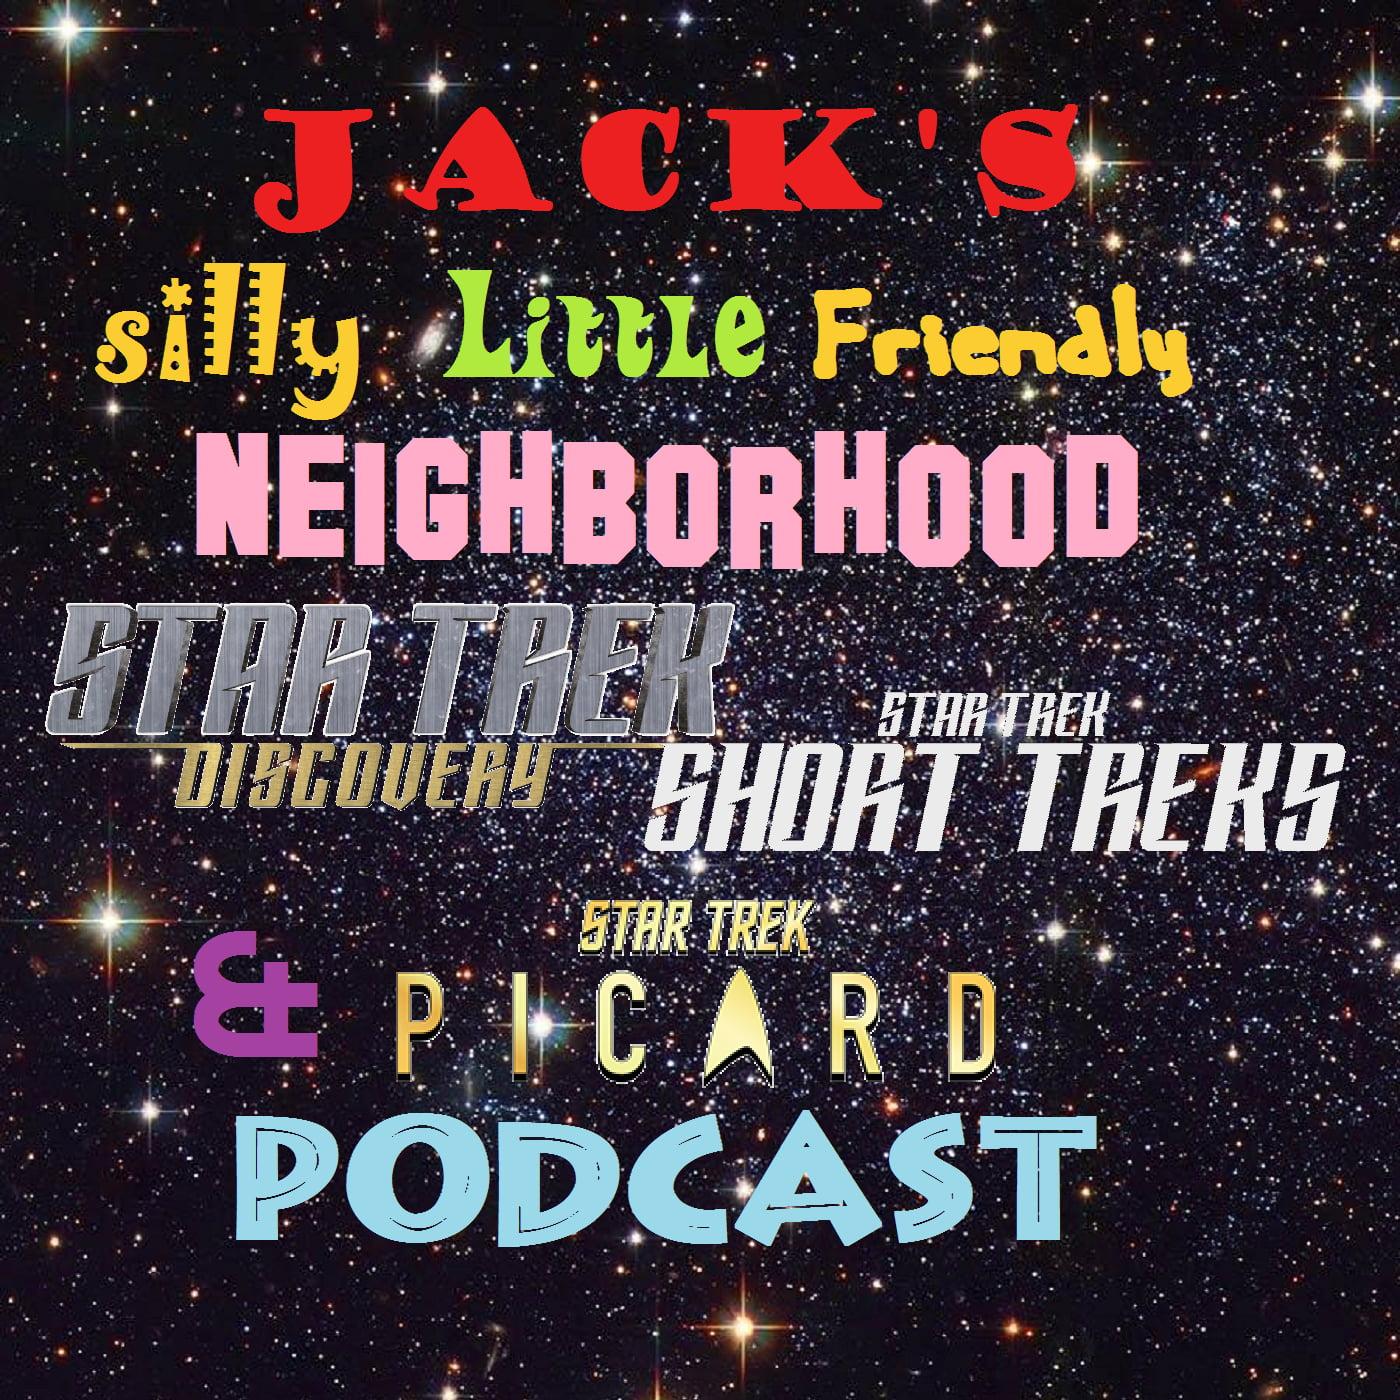 Jack's Silly Little Friendly Neighborhood Star Trek Discovery, Short Treks & Podcast show art